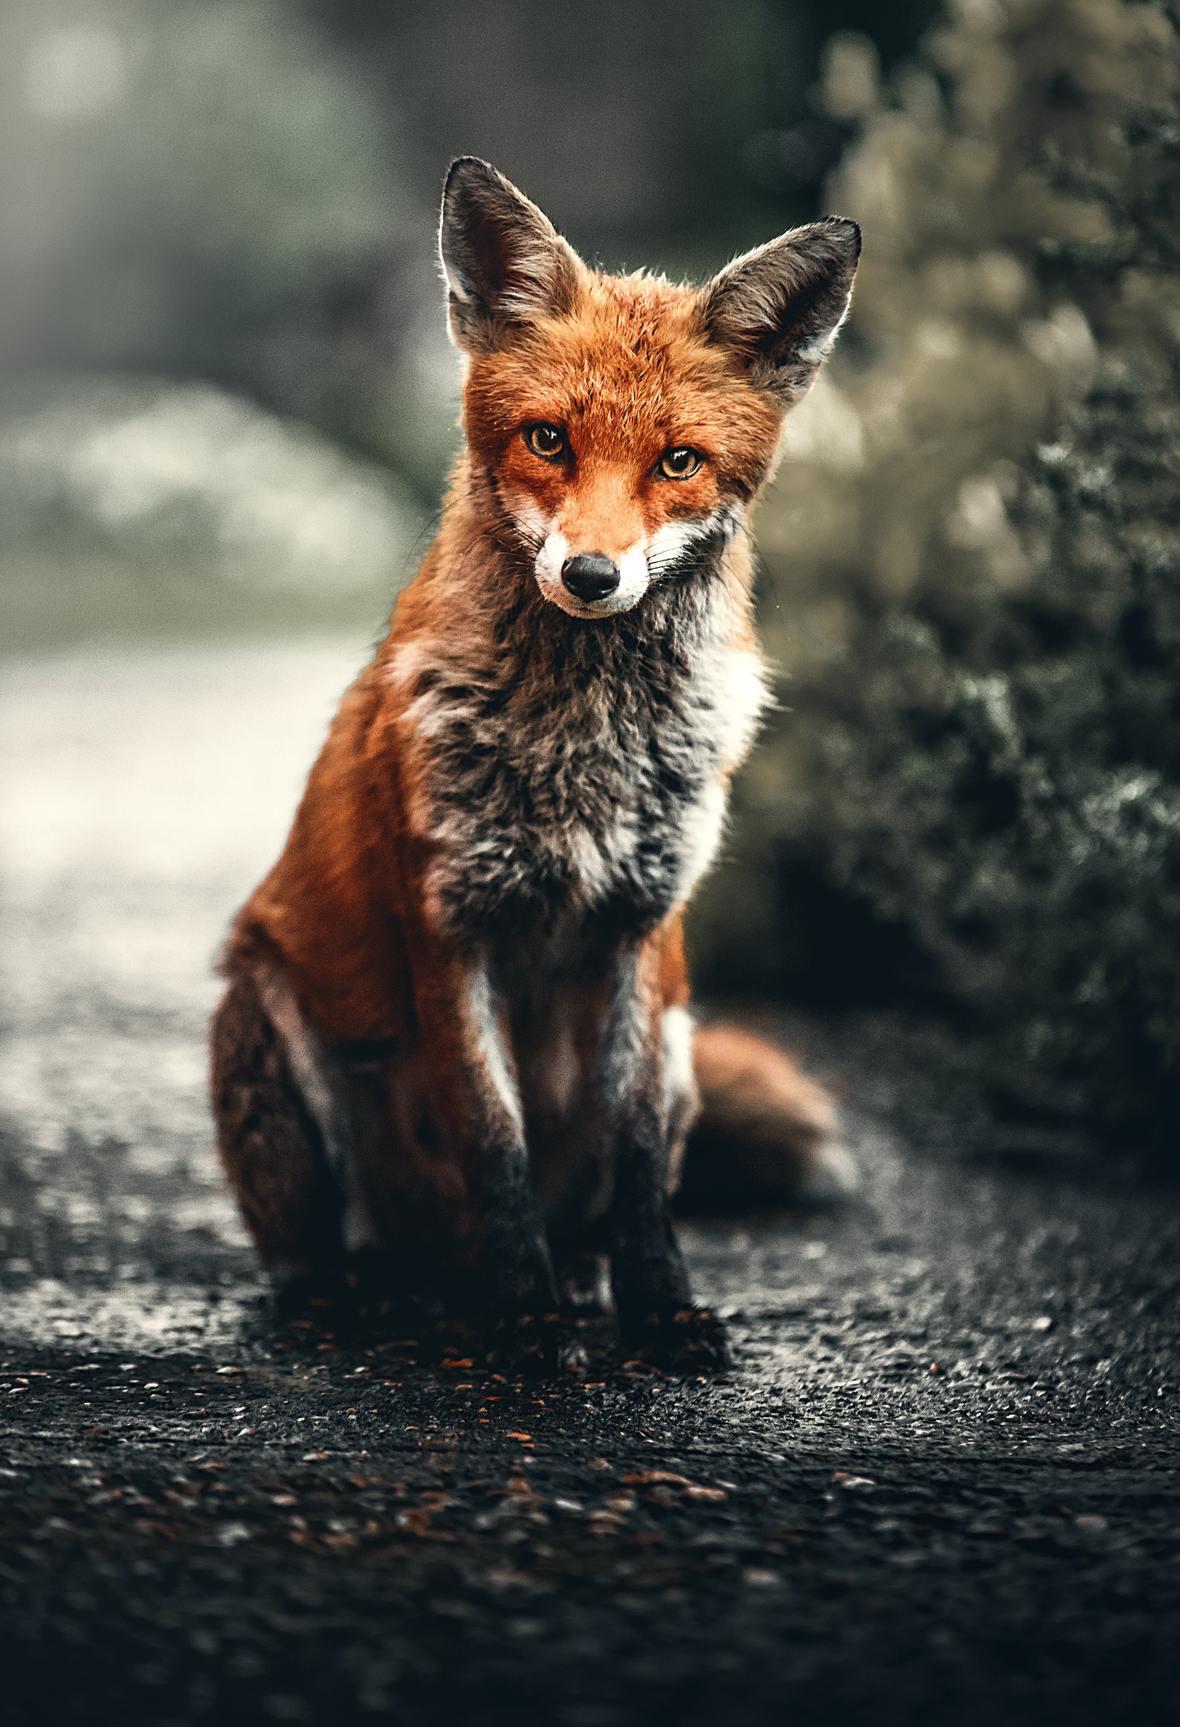 photo-of-fox-sitting-on-ground-2295744